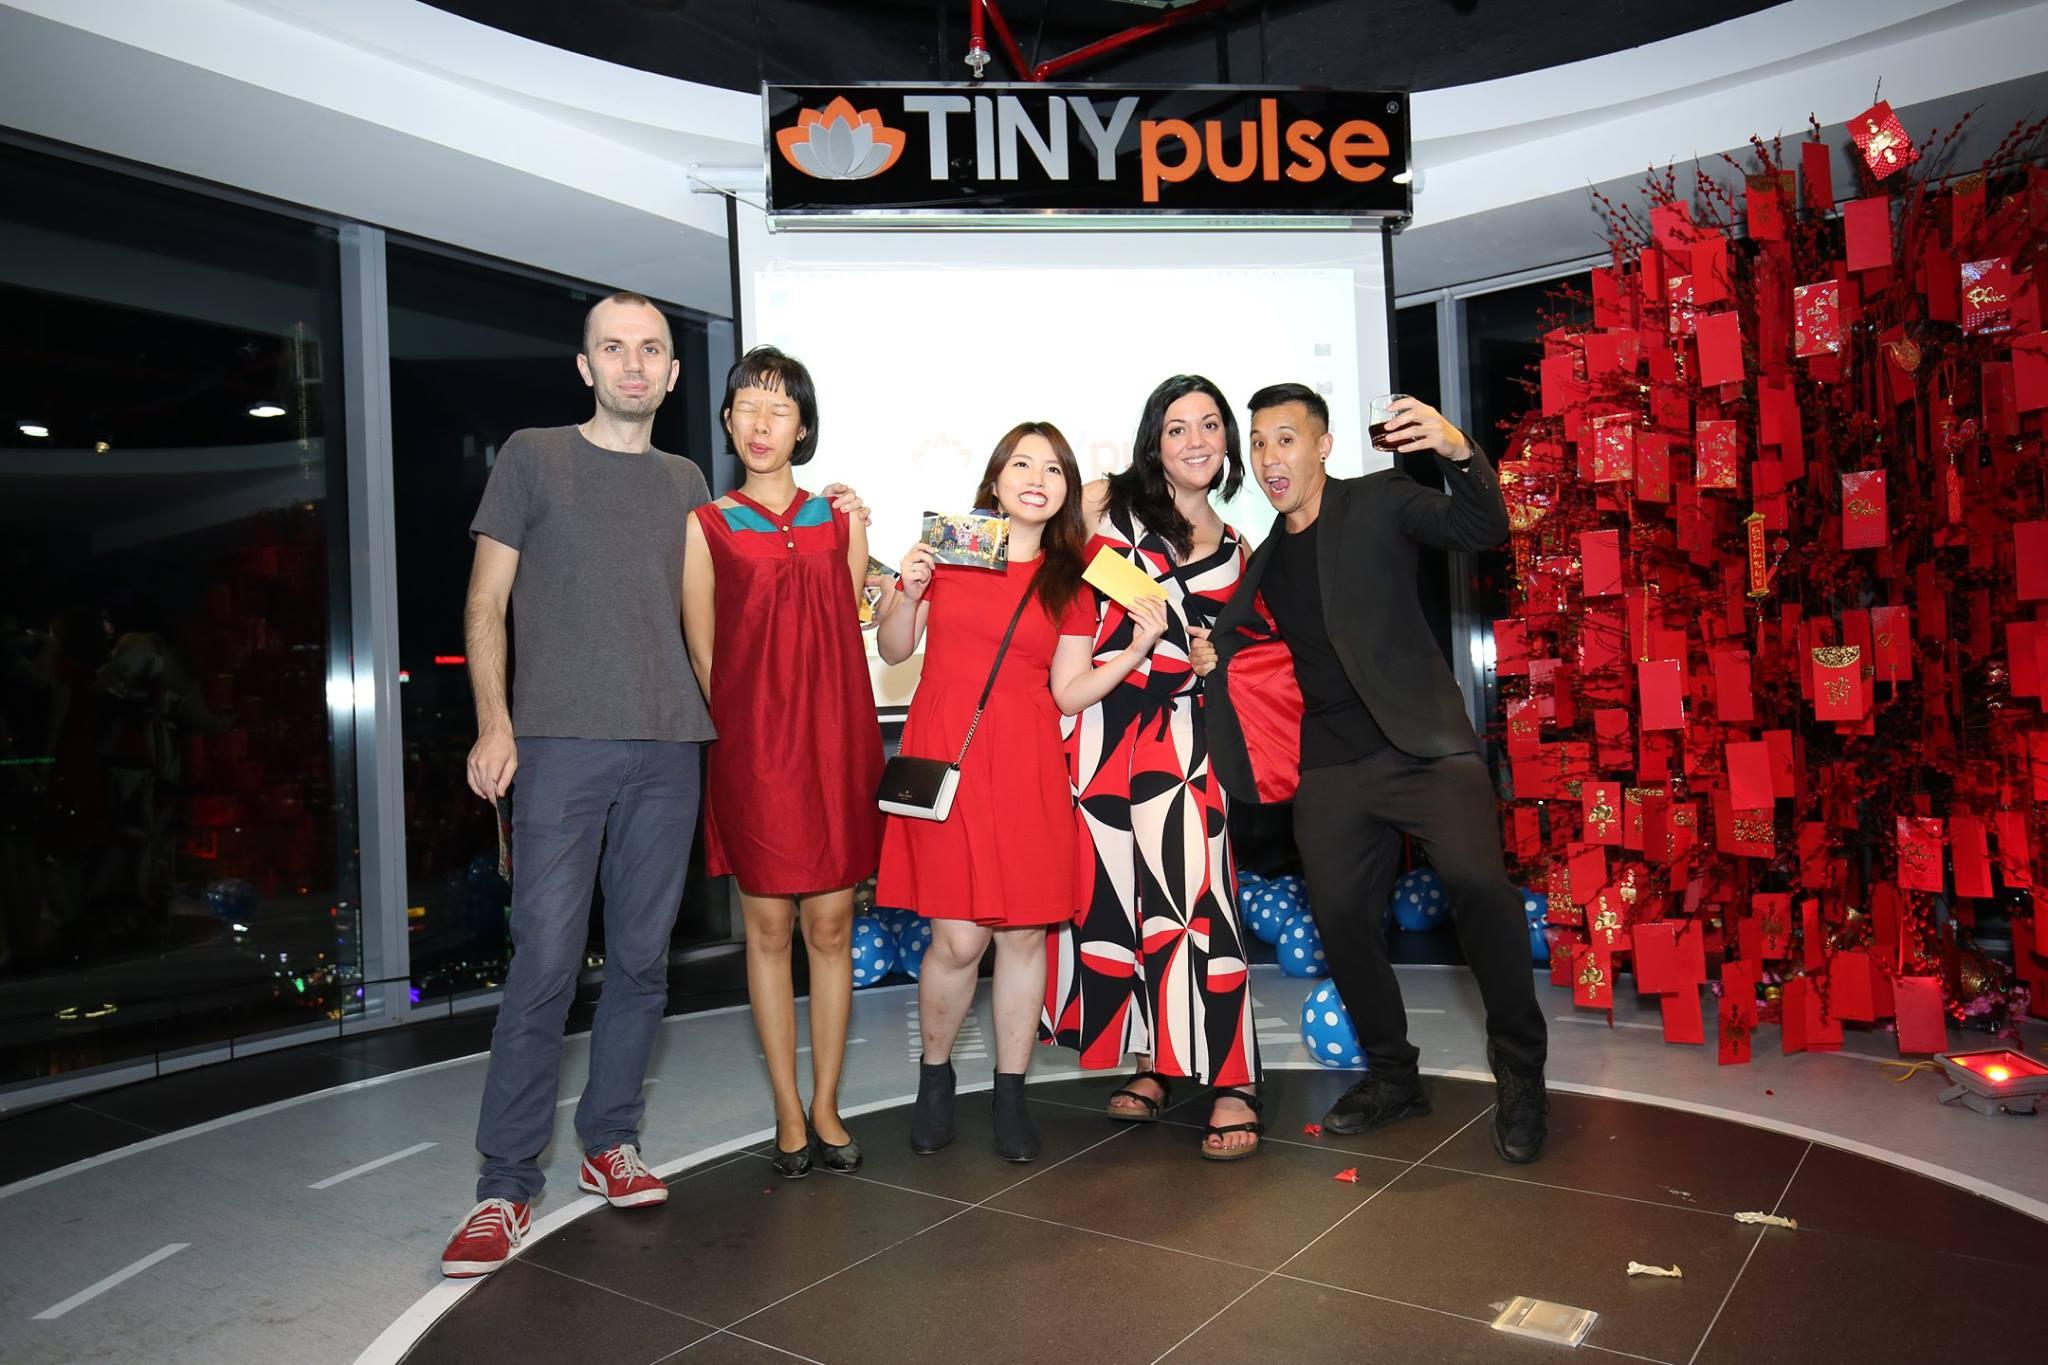 TinyPulse